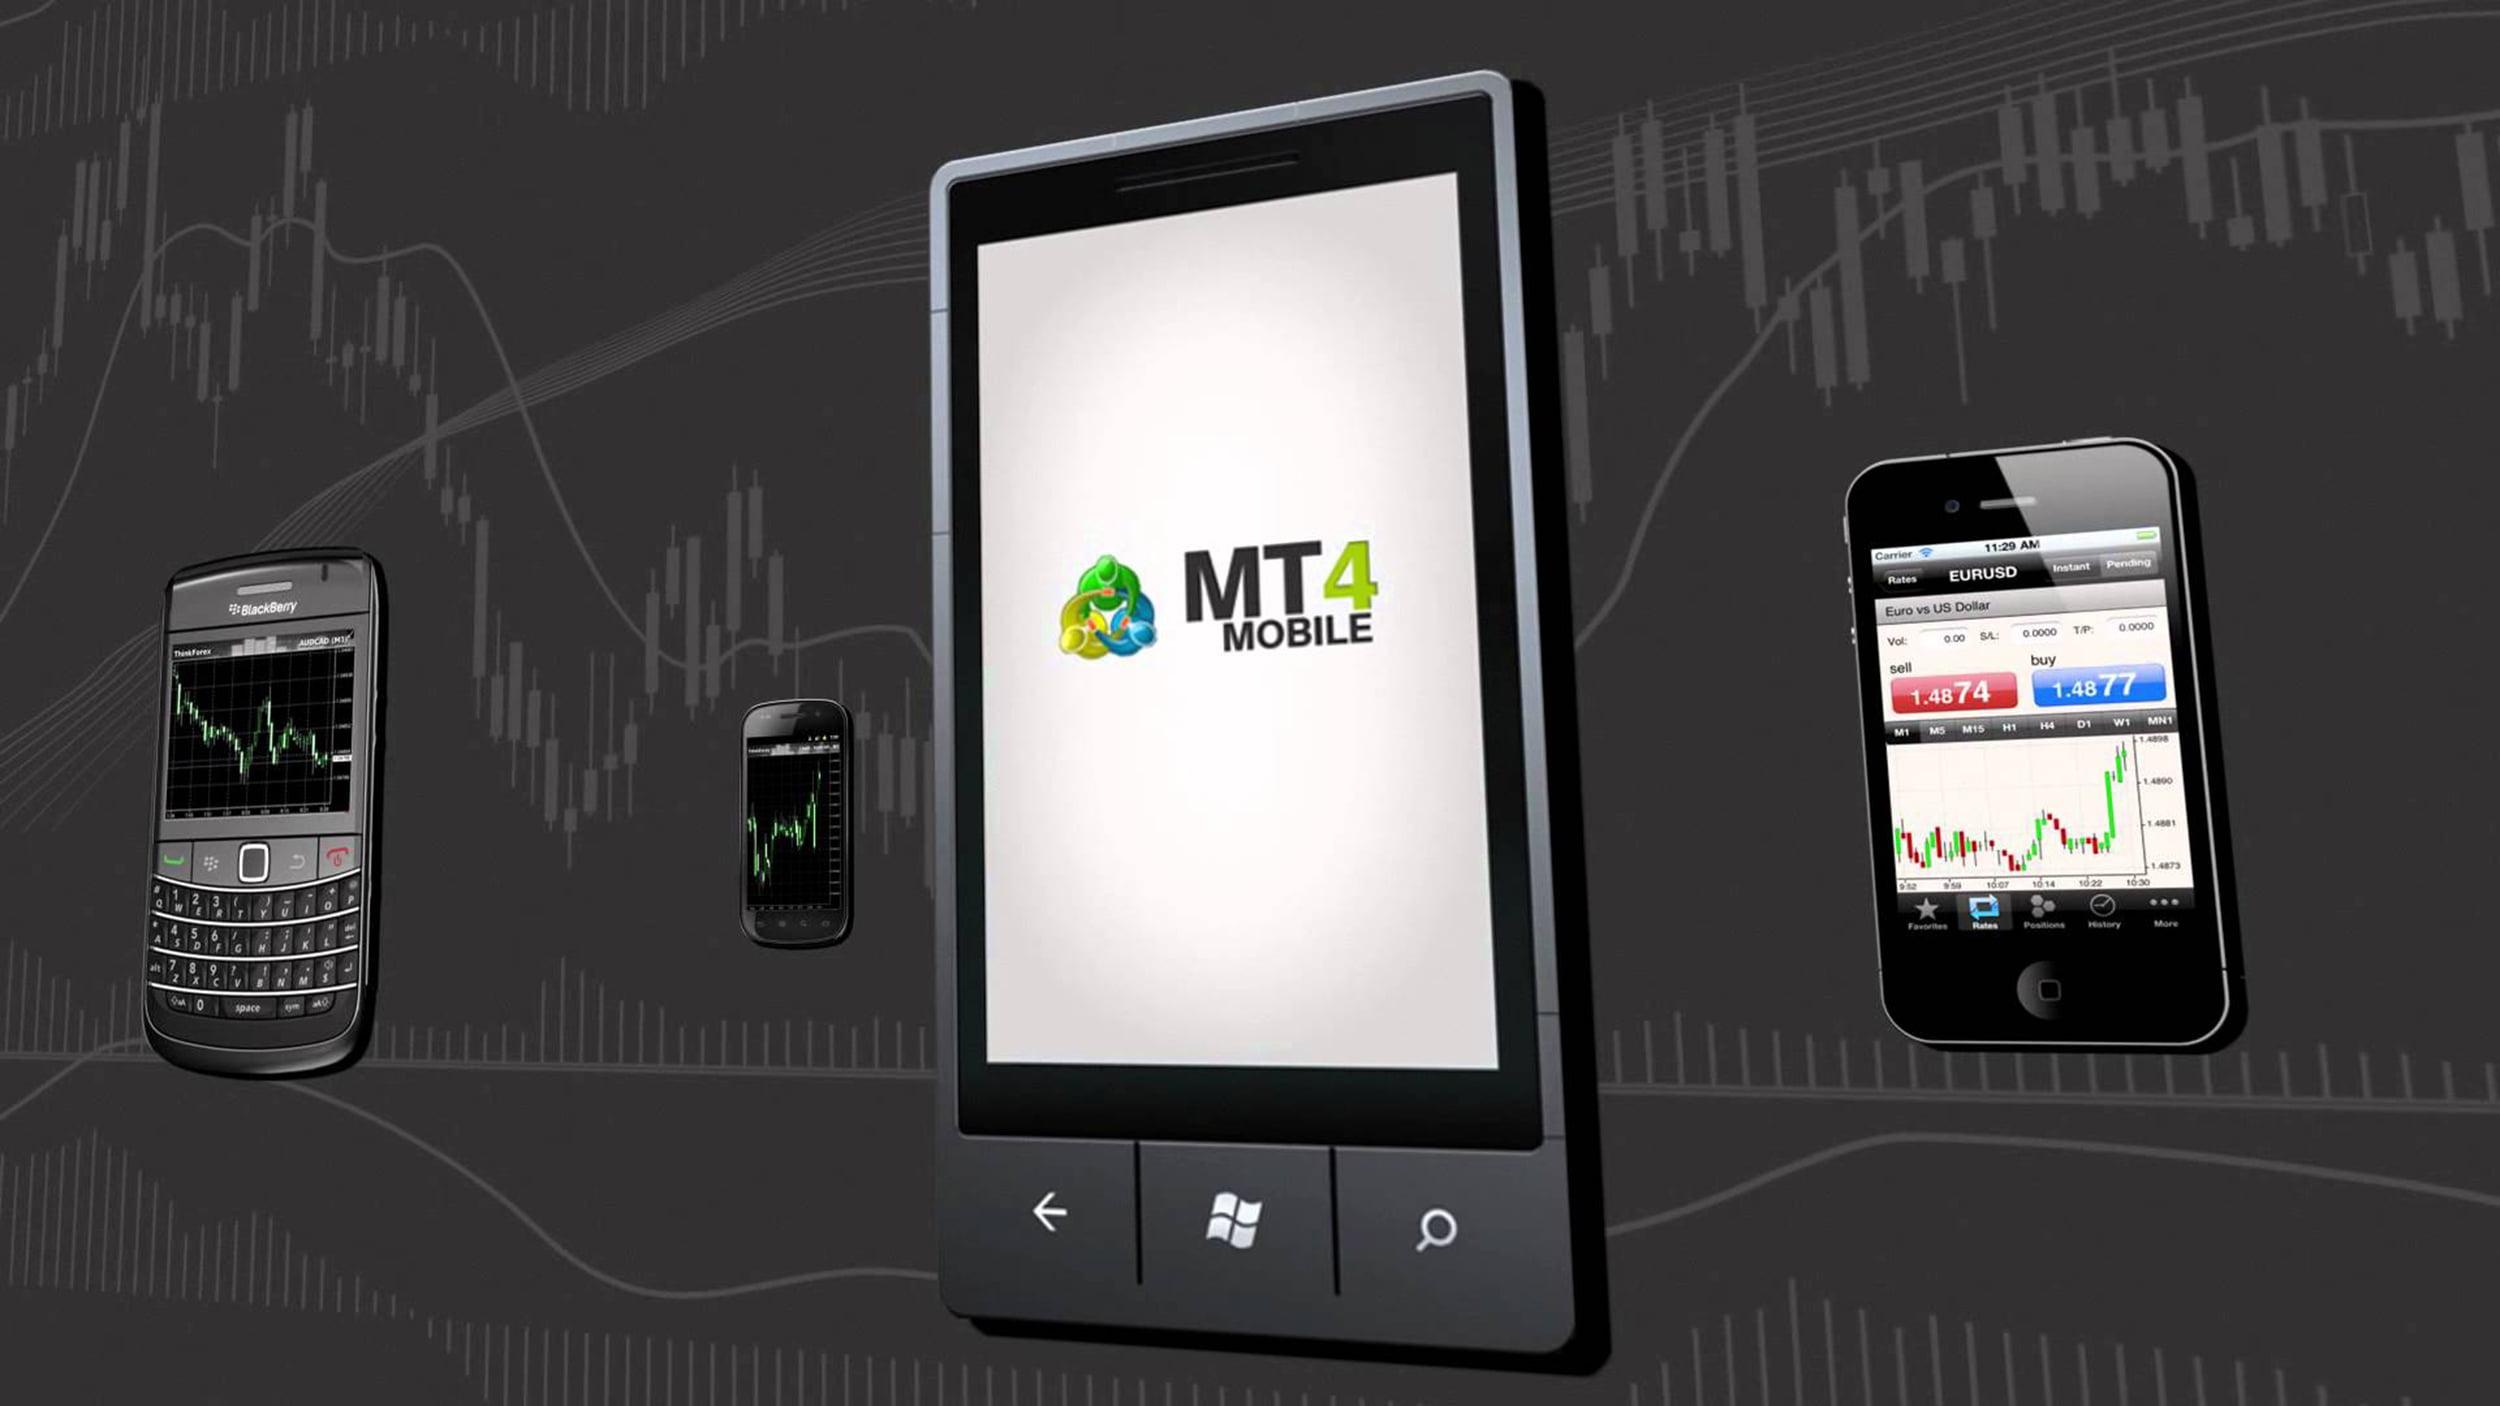 Metatrader 4 можно установить на смартфон